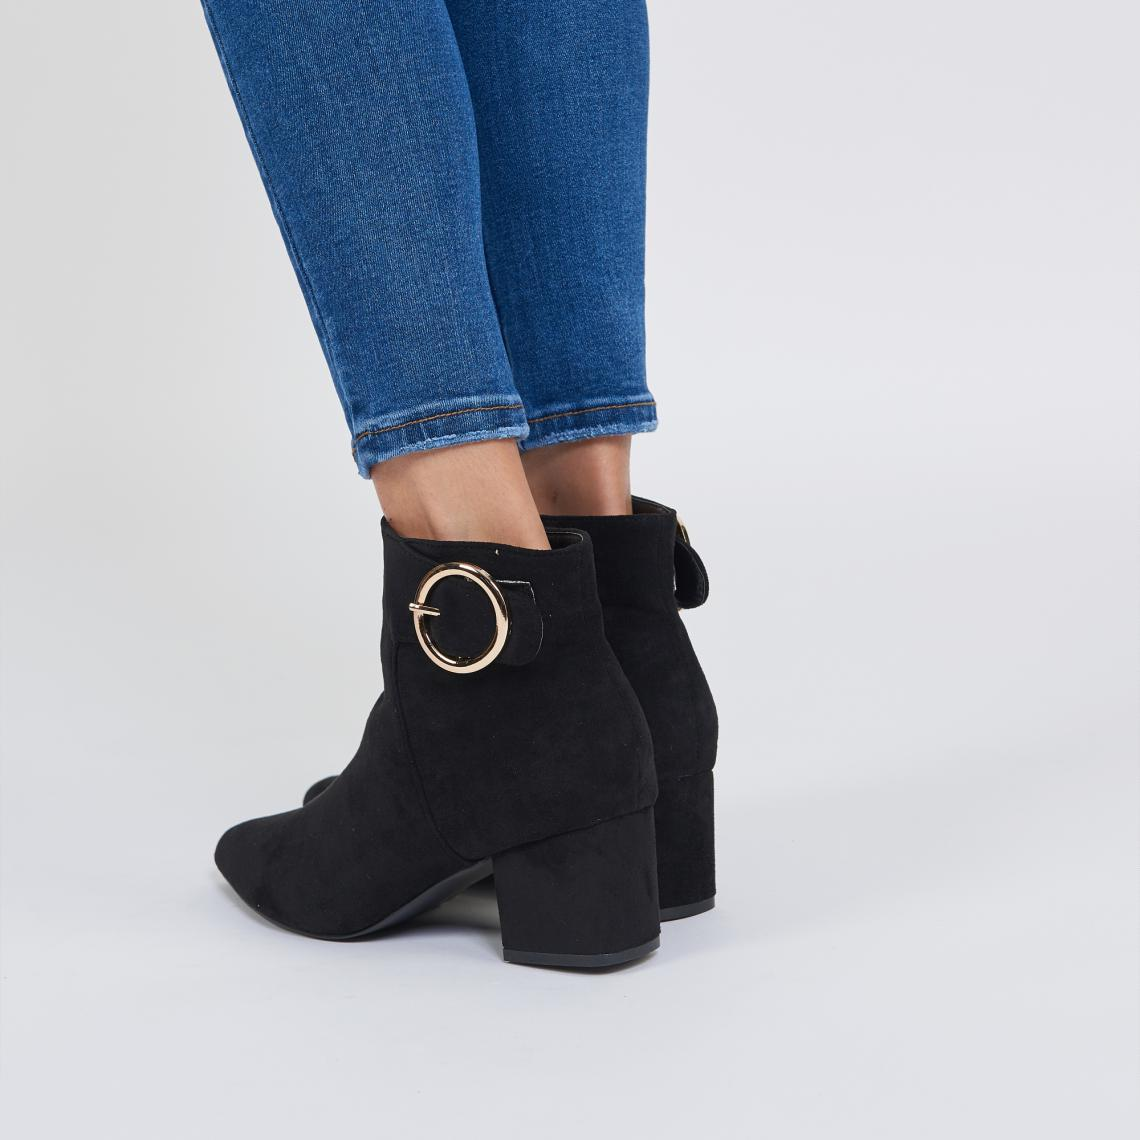 bottines a talon noir avec boucles